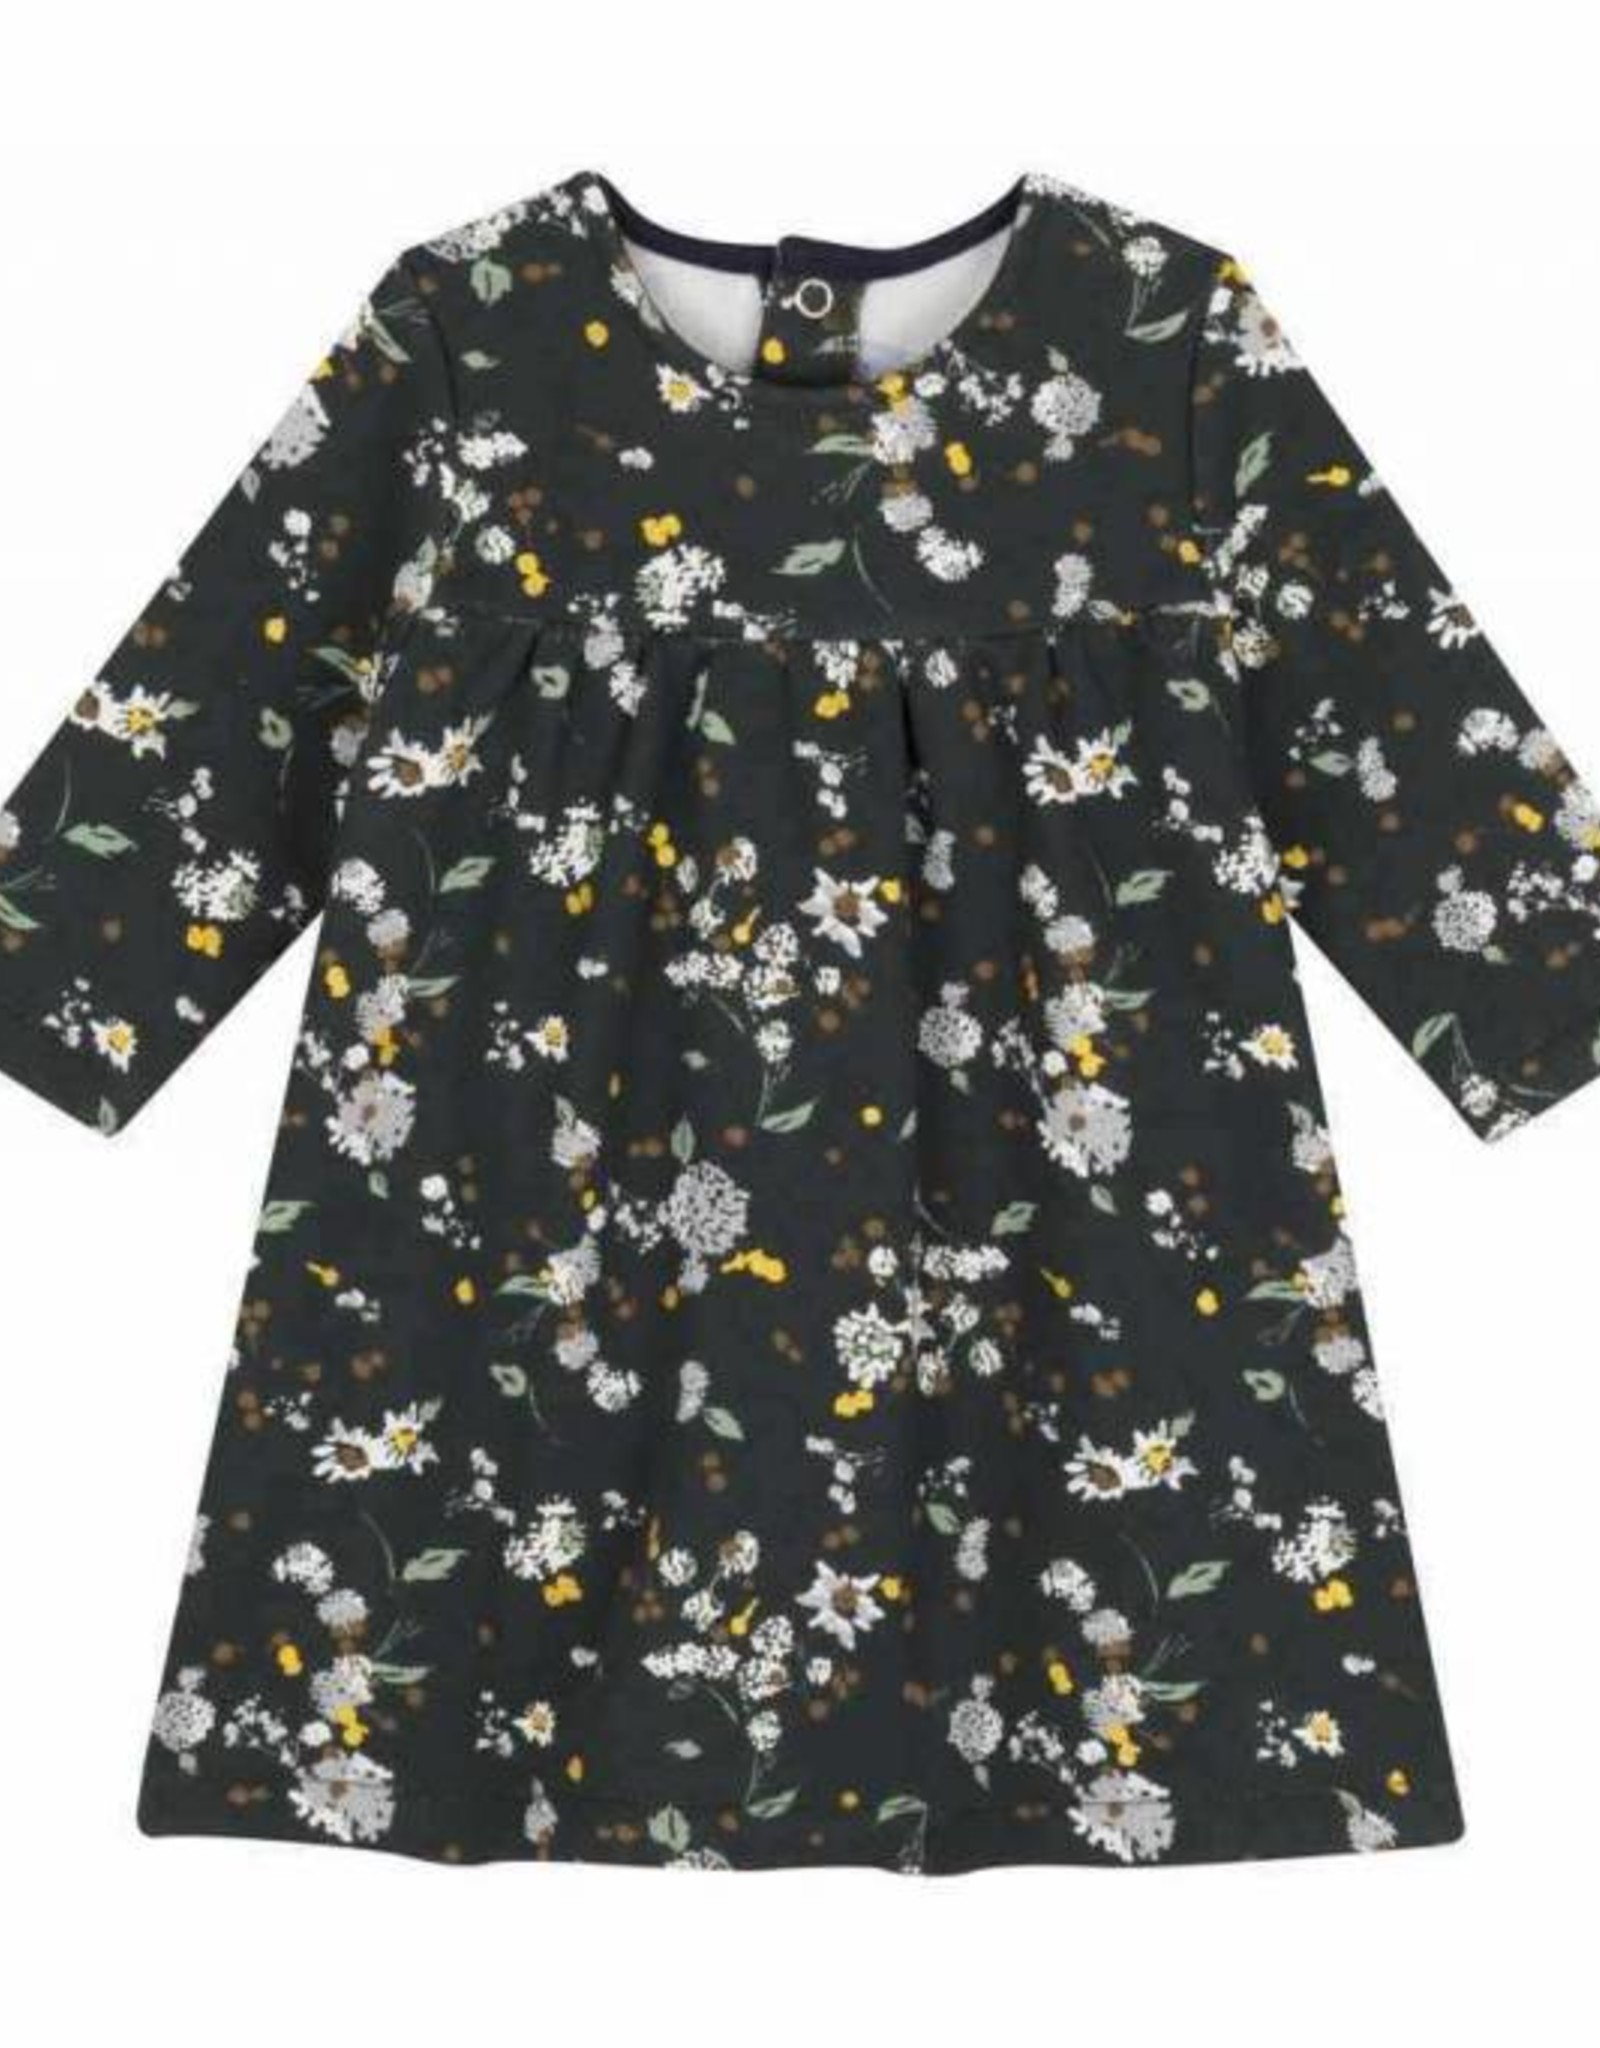 Baby's dress, flowers print